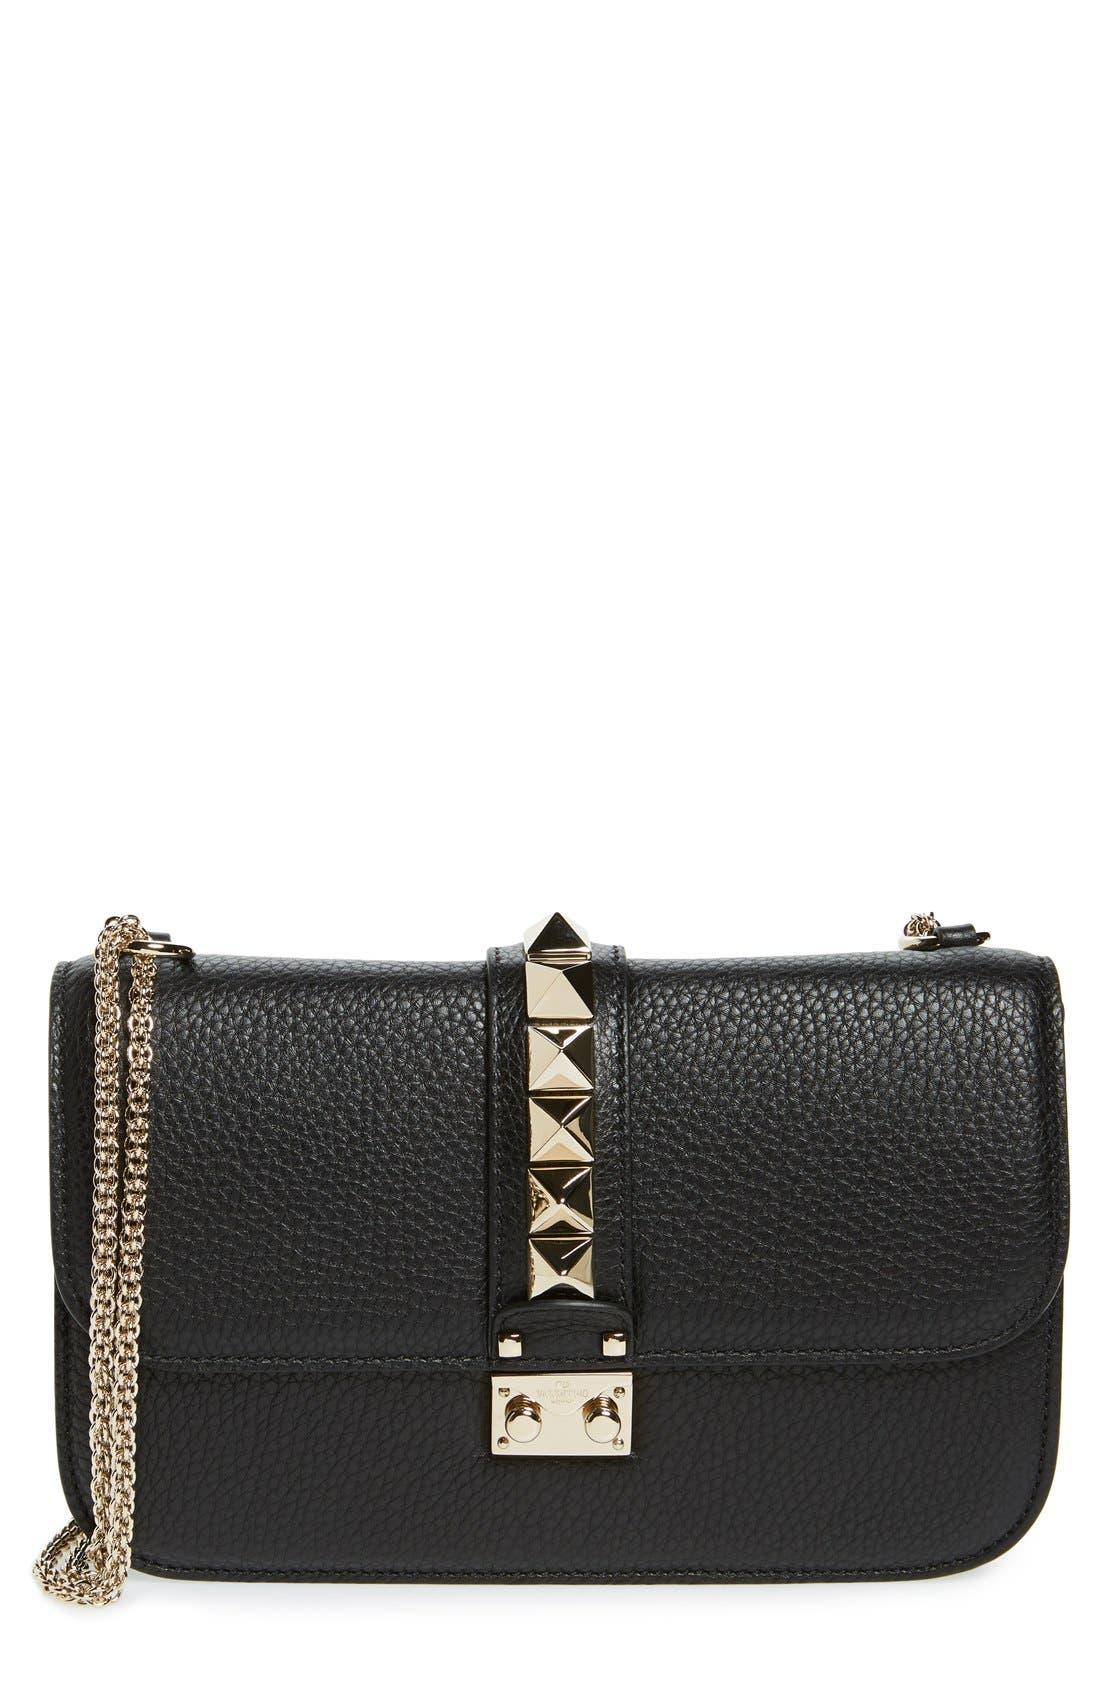 Main Image - Valentino Medium Lock Studded Leather Shoulder Bag